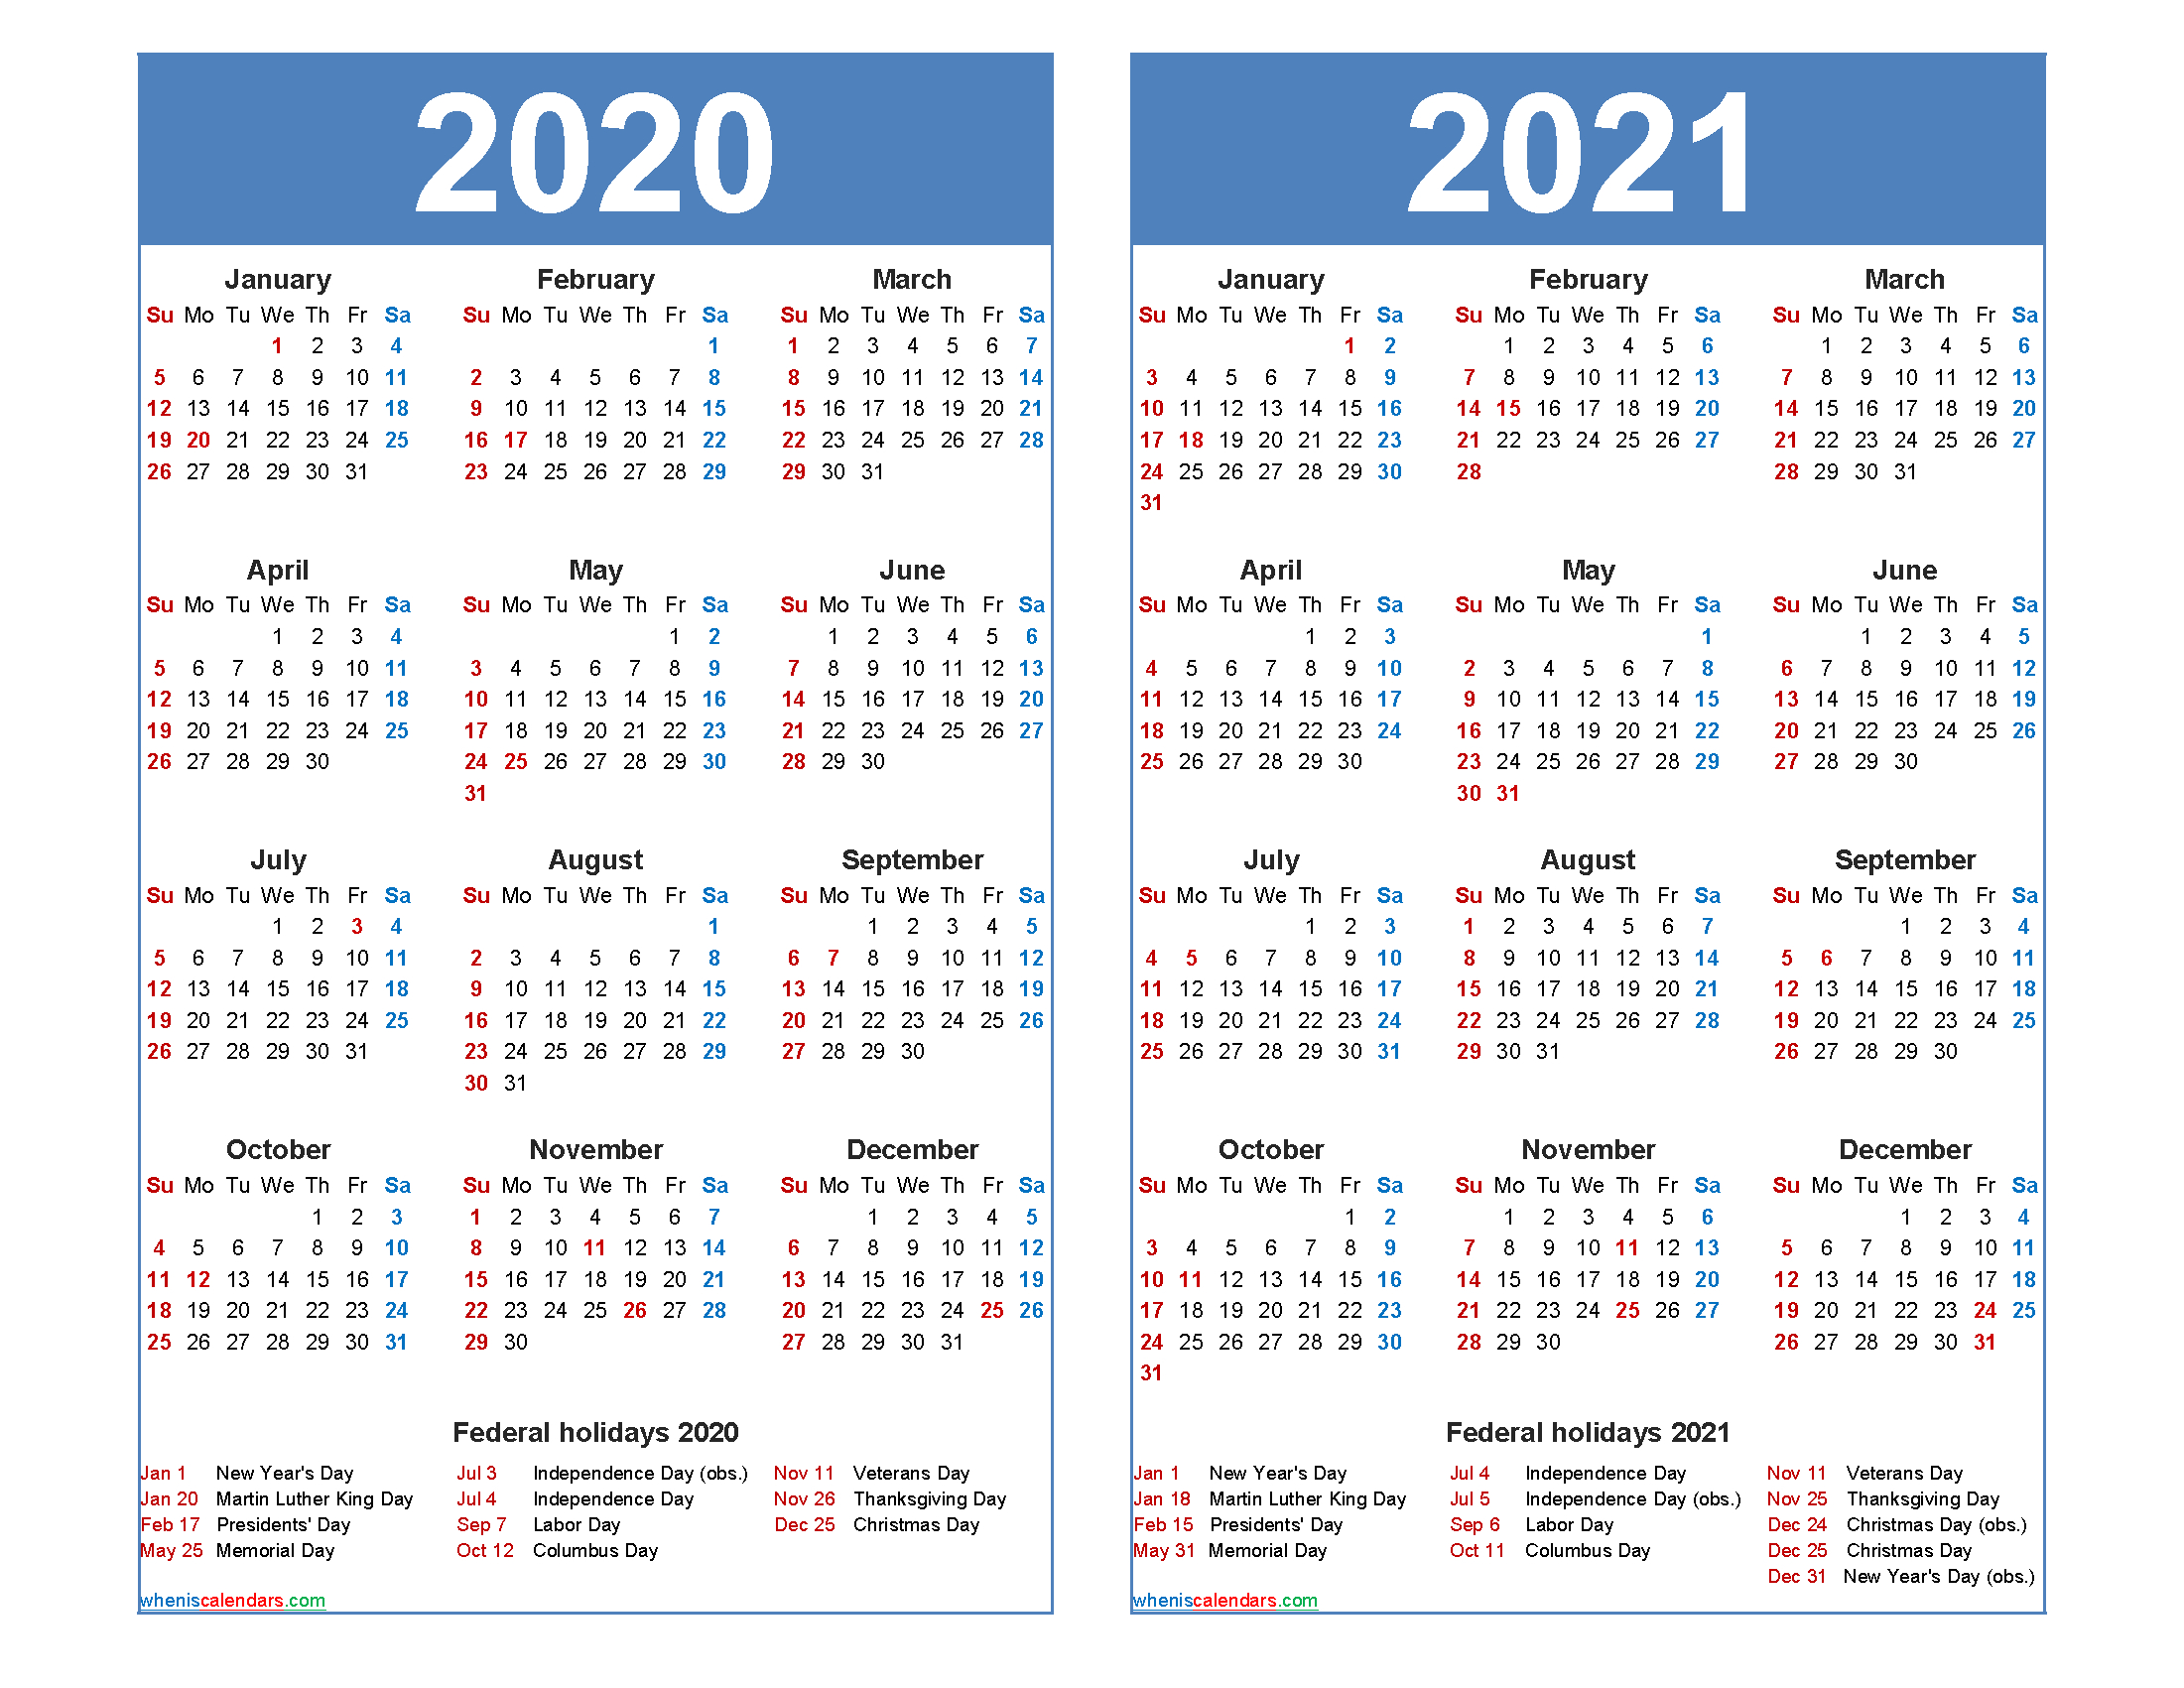 Free 2020 2021 Calendar Printable With Holidays-2 Page Calendar 2021